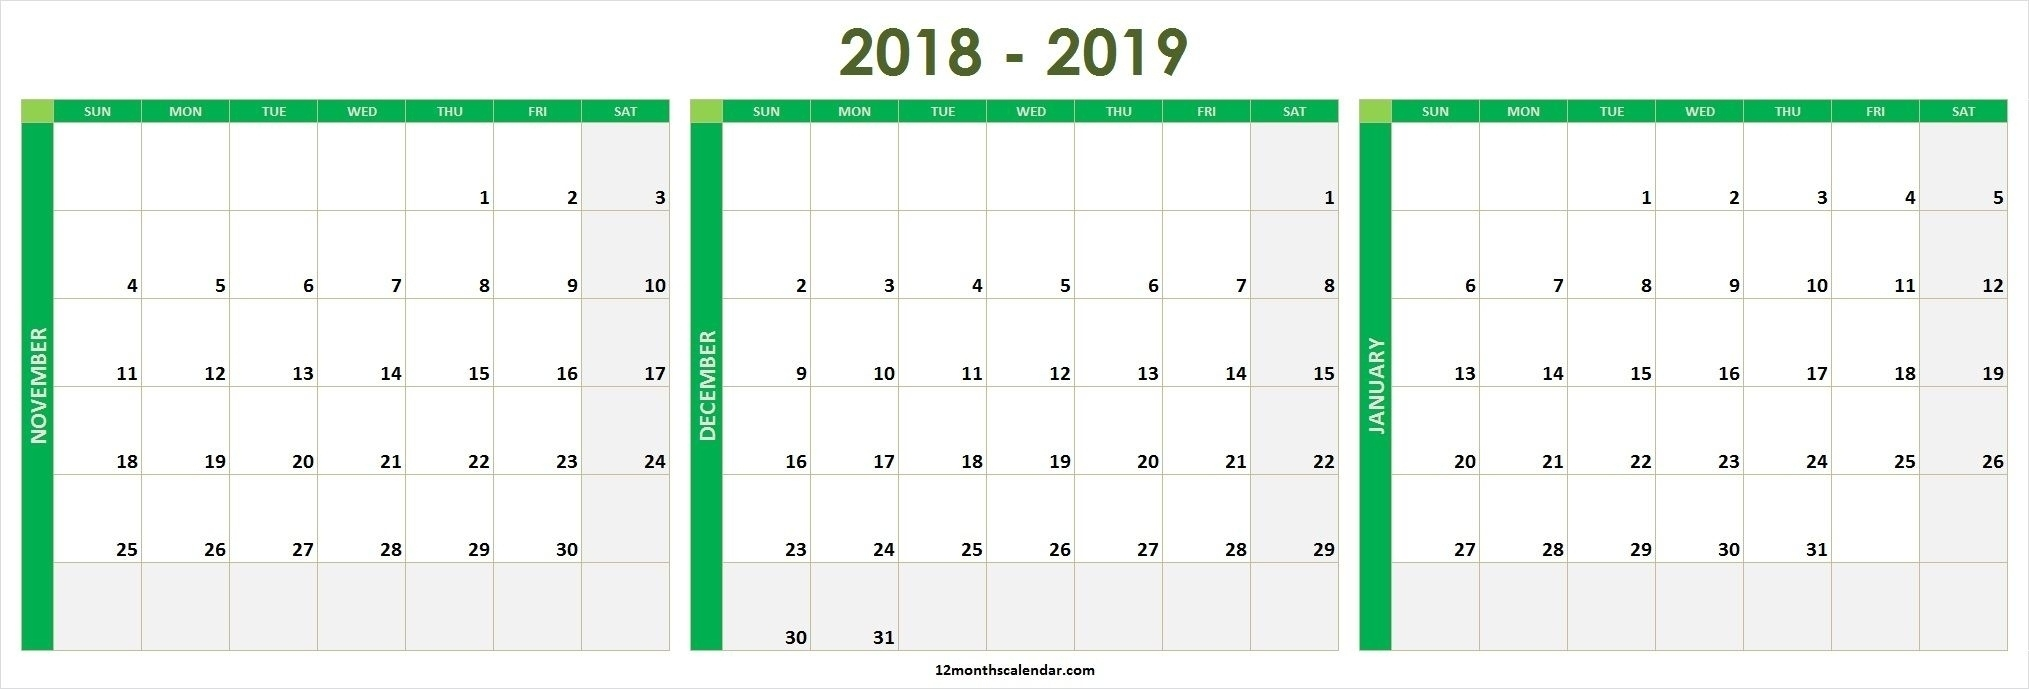 Calendar 2021 December January 2020 | Avnitasoni November December 2020 January 2021 Calendar